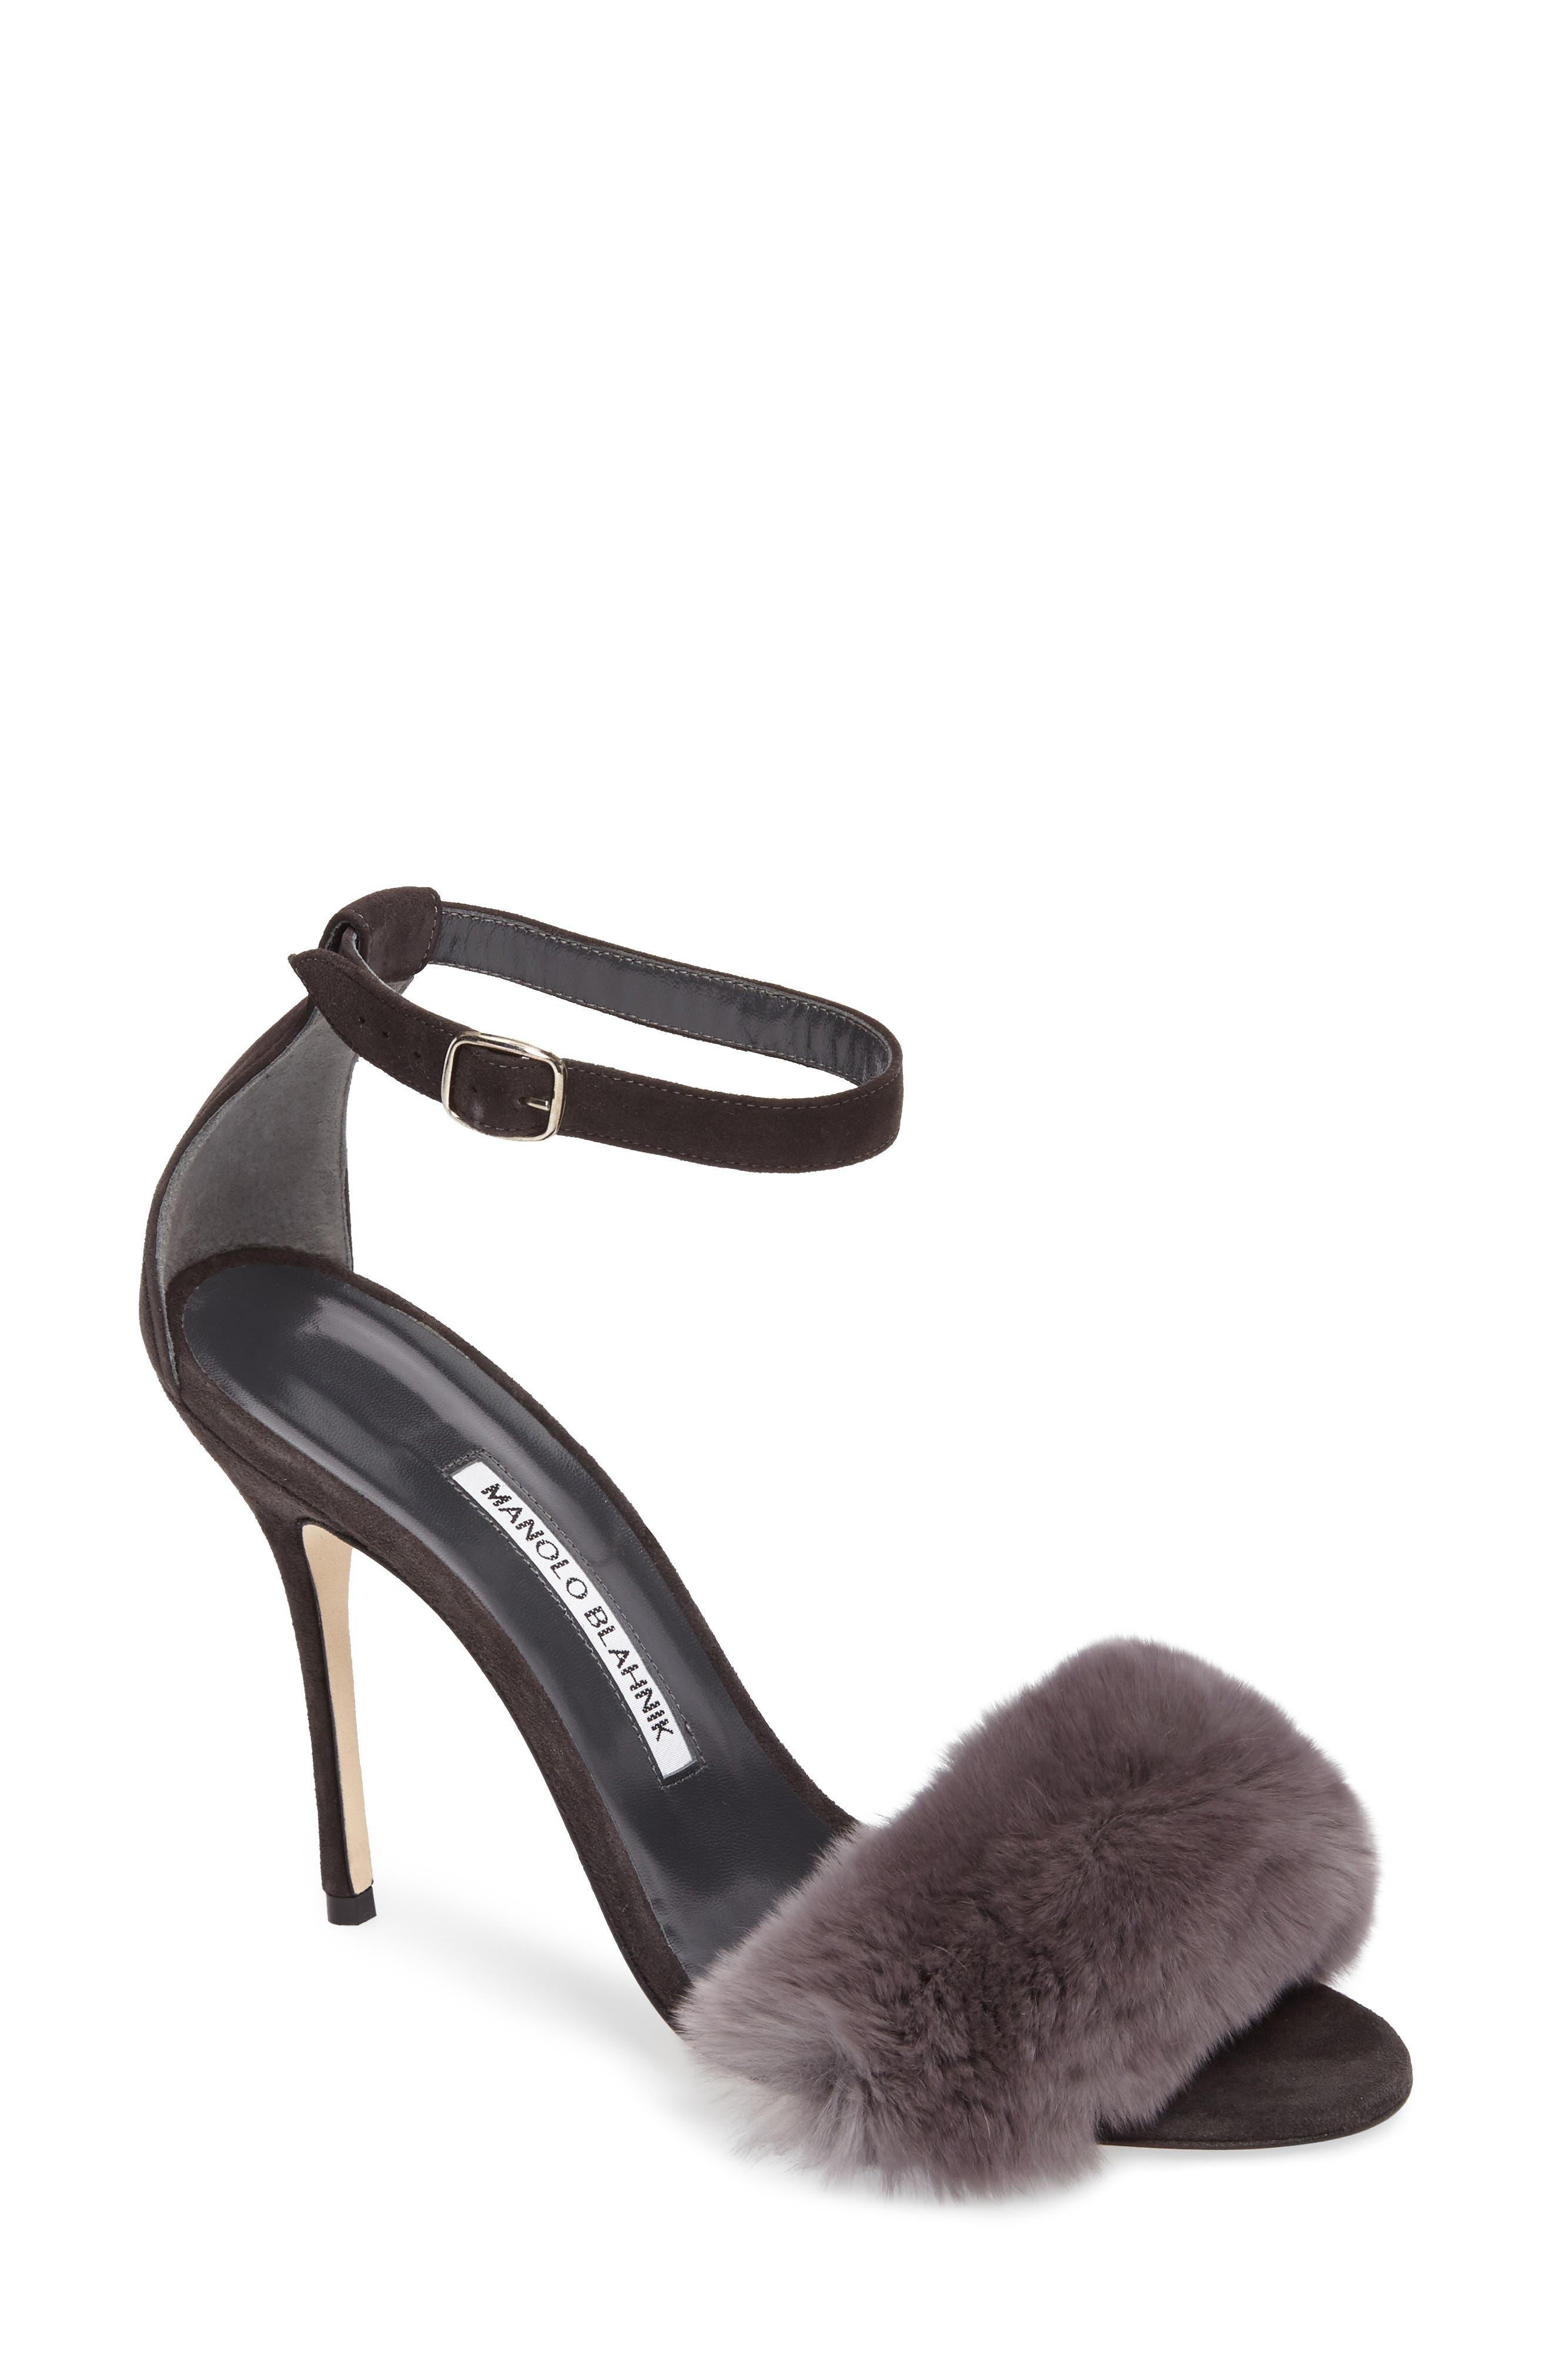 Mincha Genuine Rabbit Fur Sandal,                             Main thumbnail 1, color,                             Grey